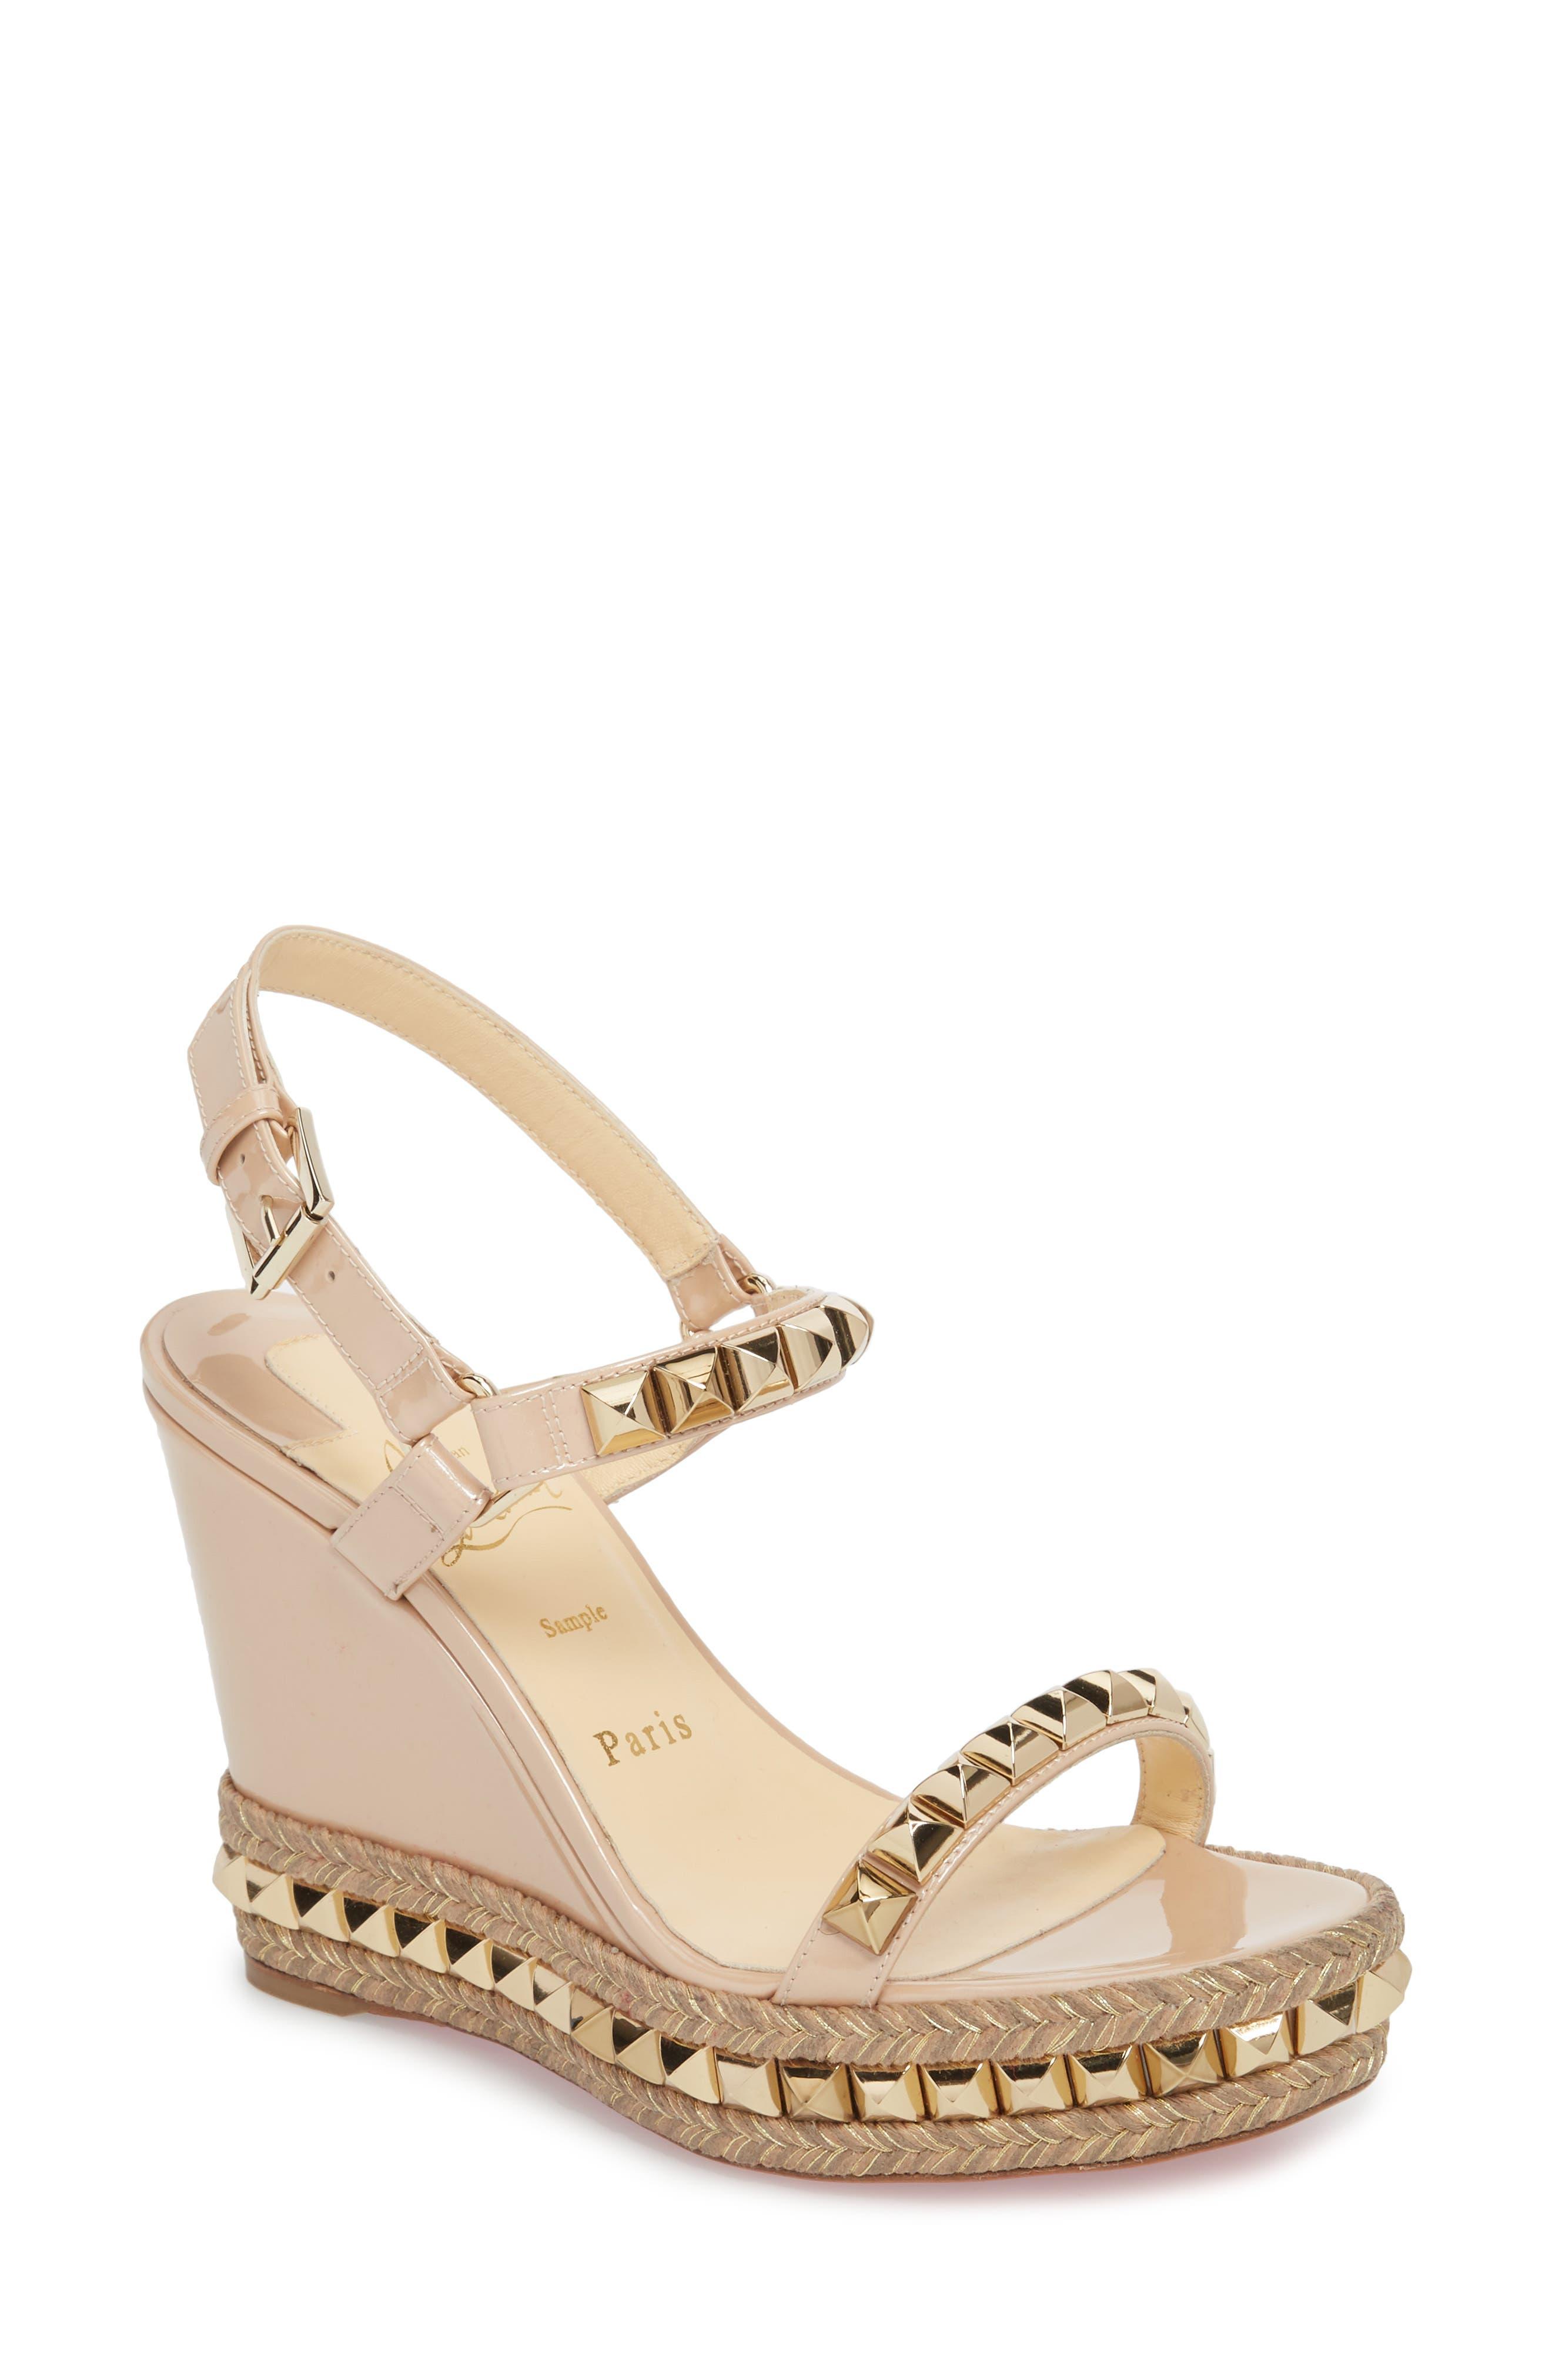 Cataclou Espadrille Wedge Sandal,                         Main,                         color, NUDE/ LIGHT GOLD